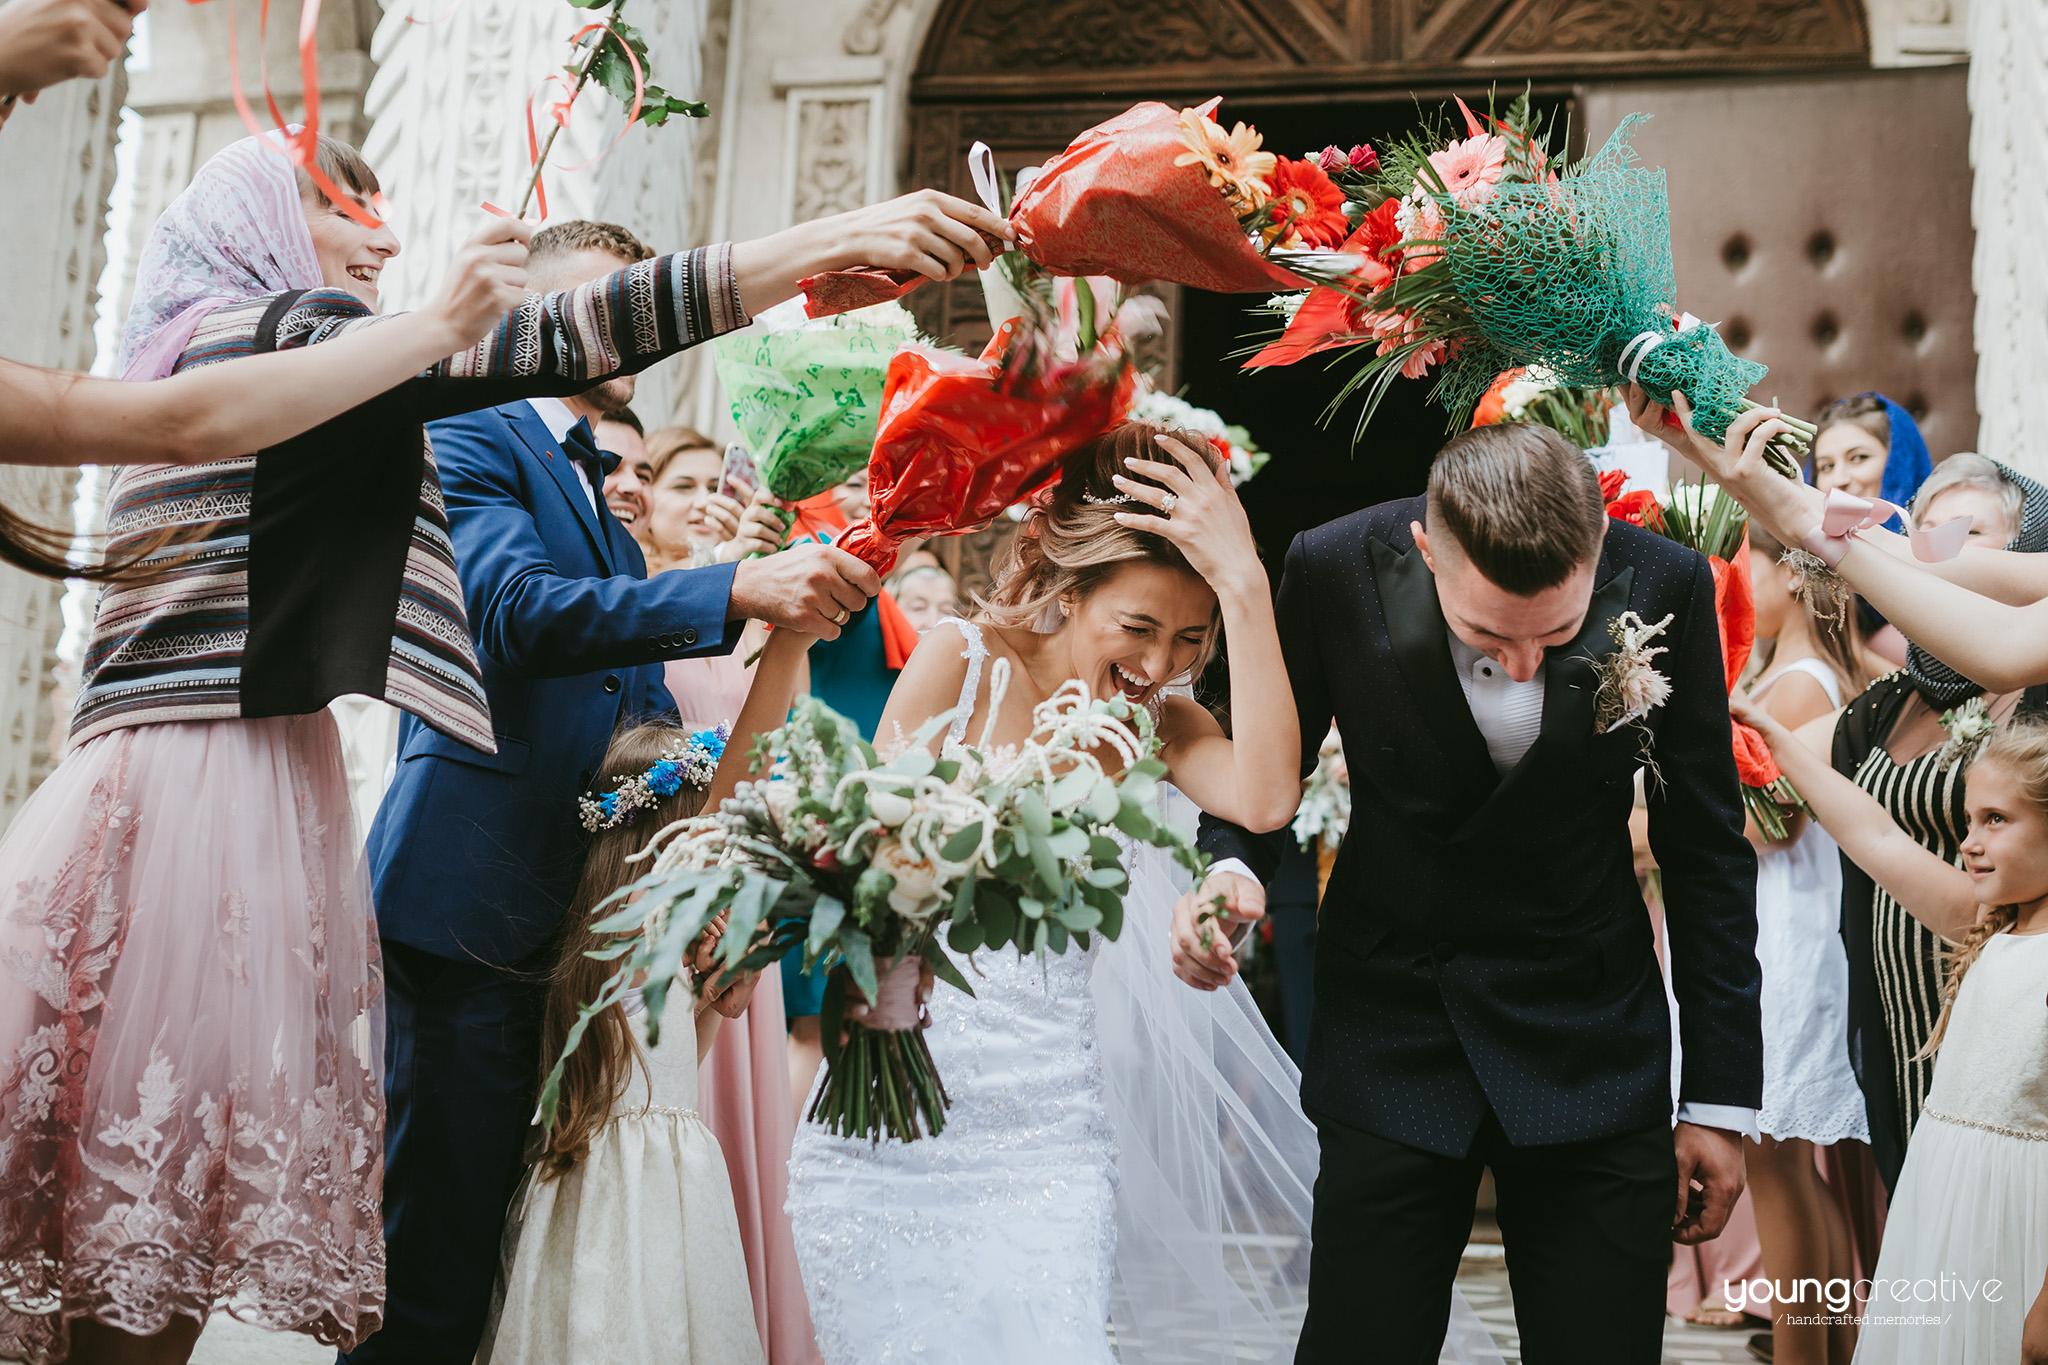 Iuliana & Marian | youngcreative.info media © Dan Filipciuc, Cristina Bejan | fotografie de nunta Falticeni